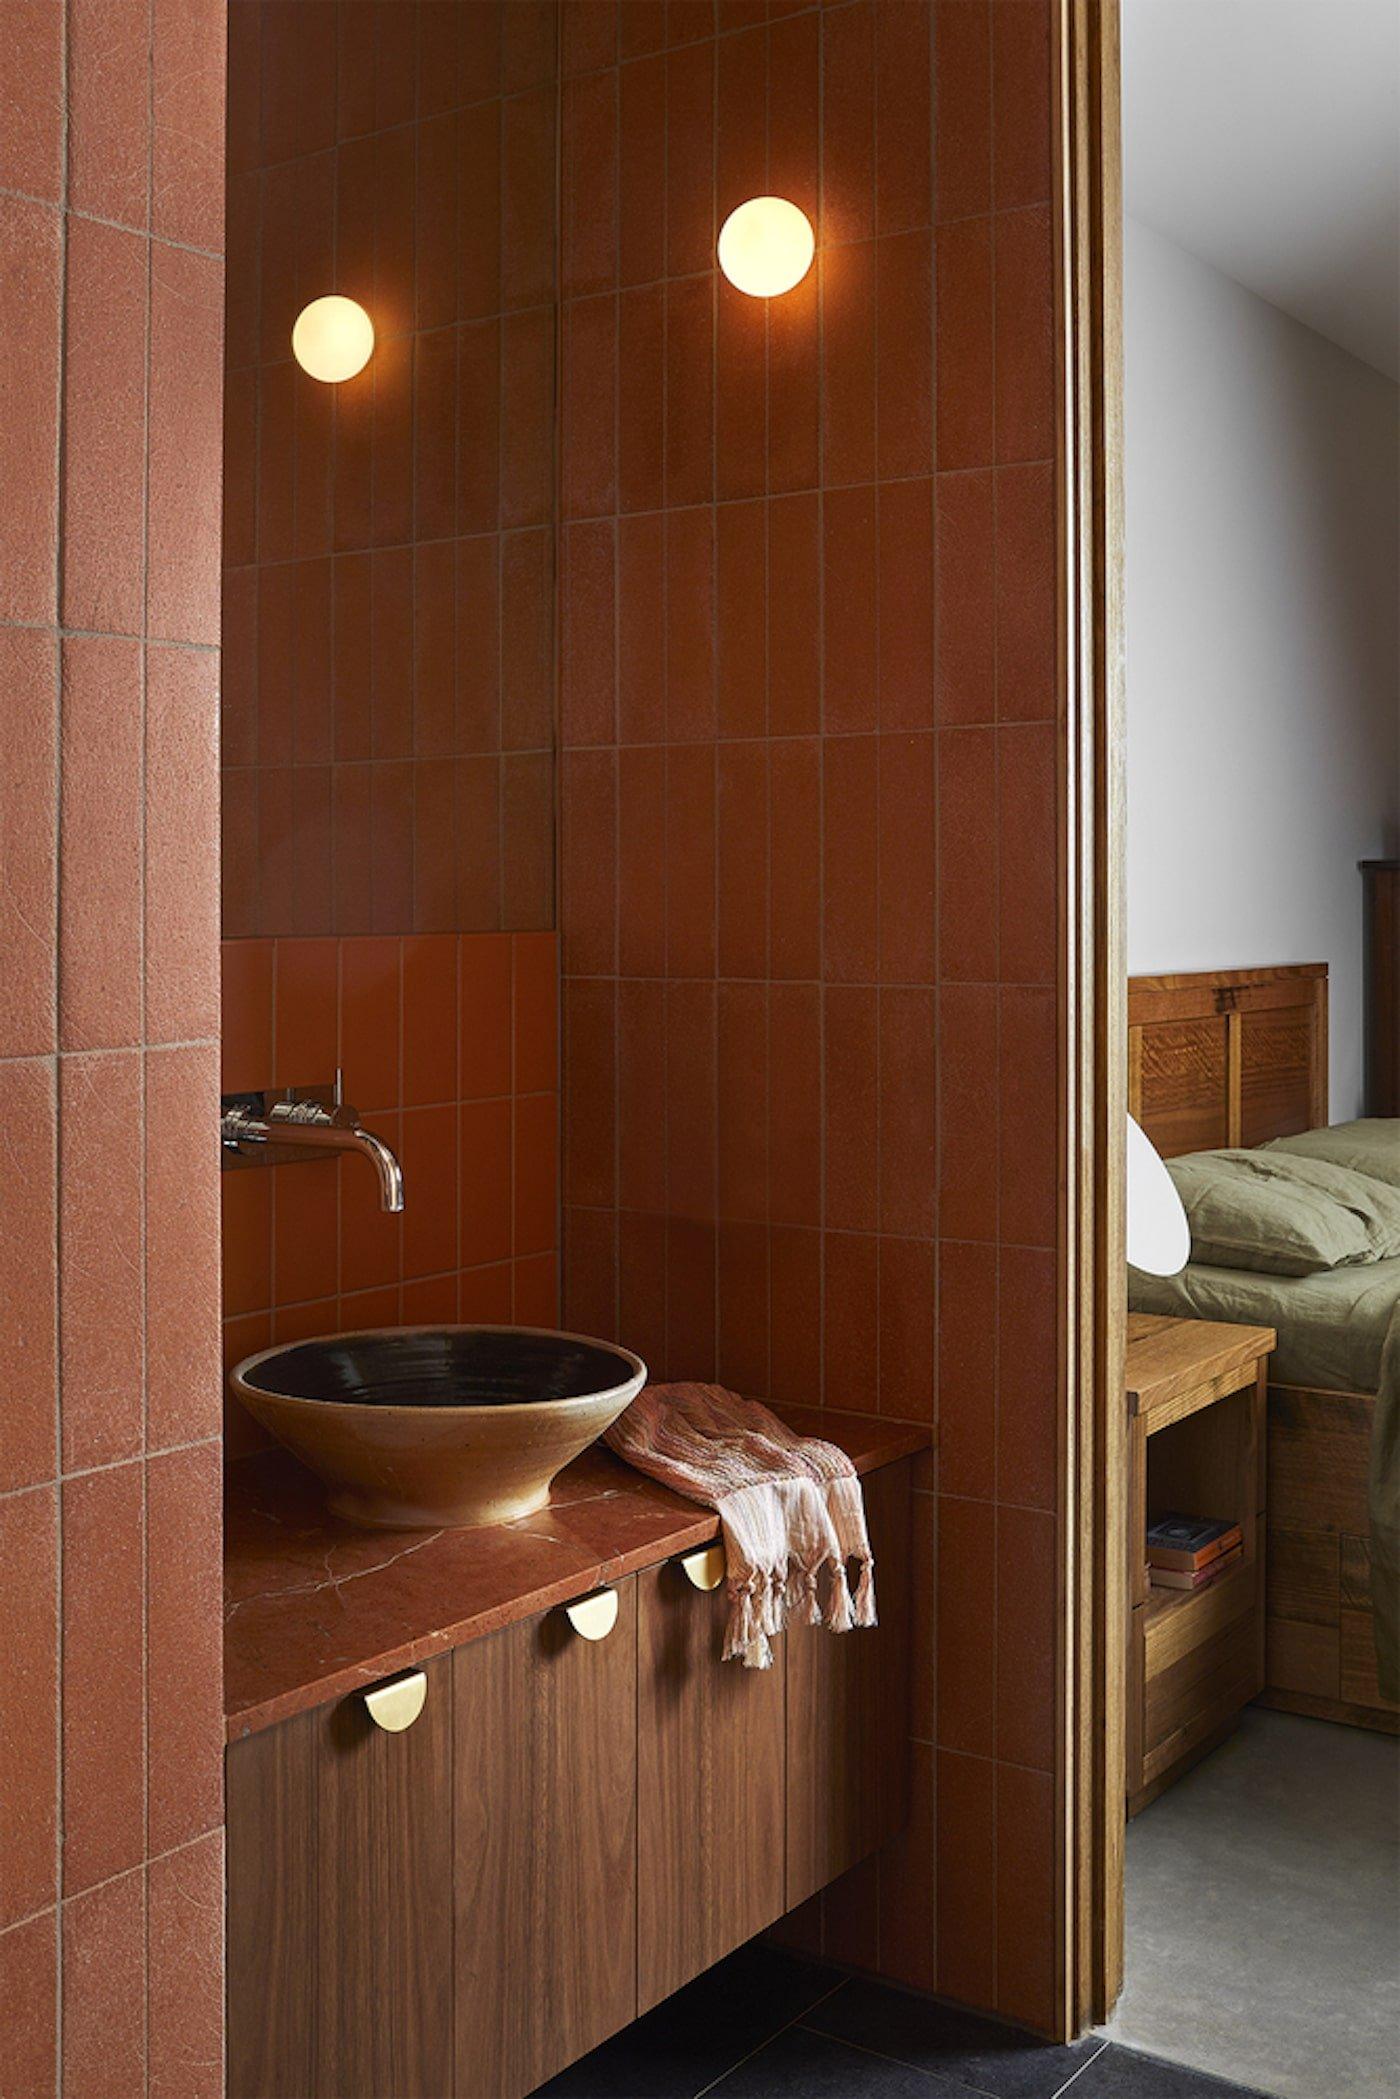 Eco Edition_MRTN Architects_Good Life House_Architecture interiors 6-min